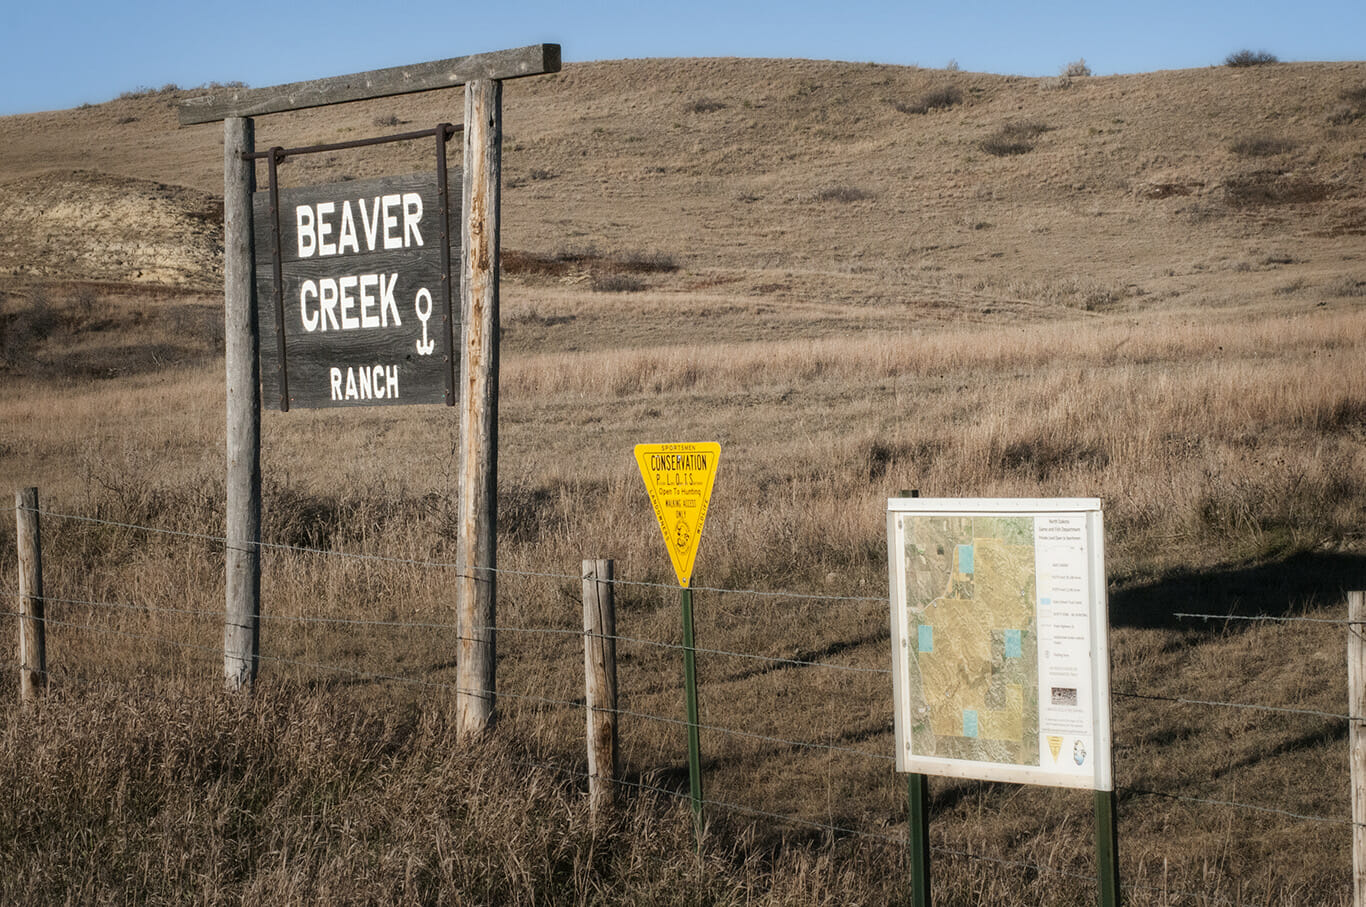 Beaver Creek Ranch sign, PLOTS sign and map